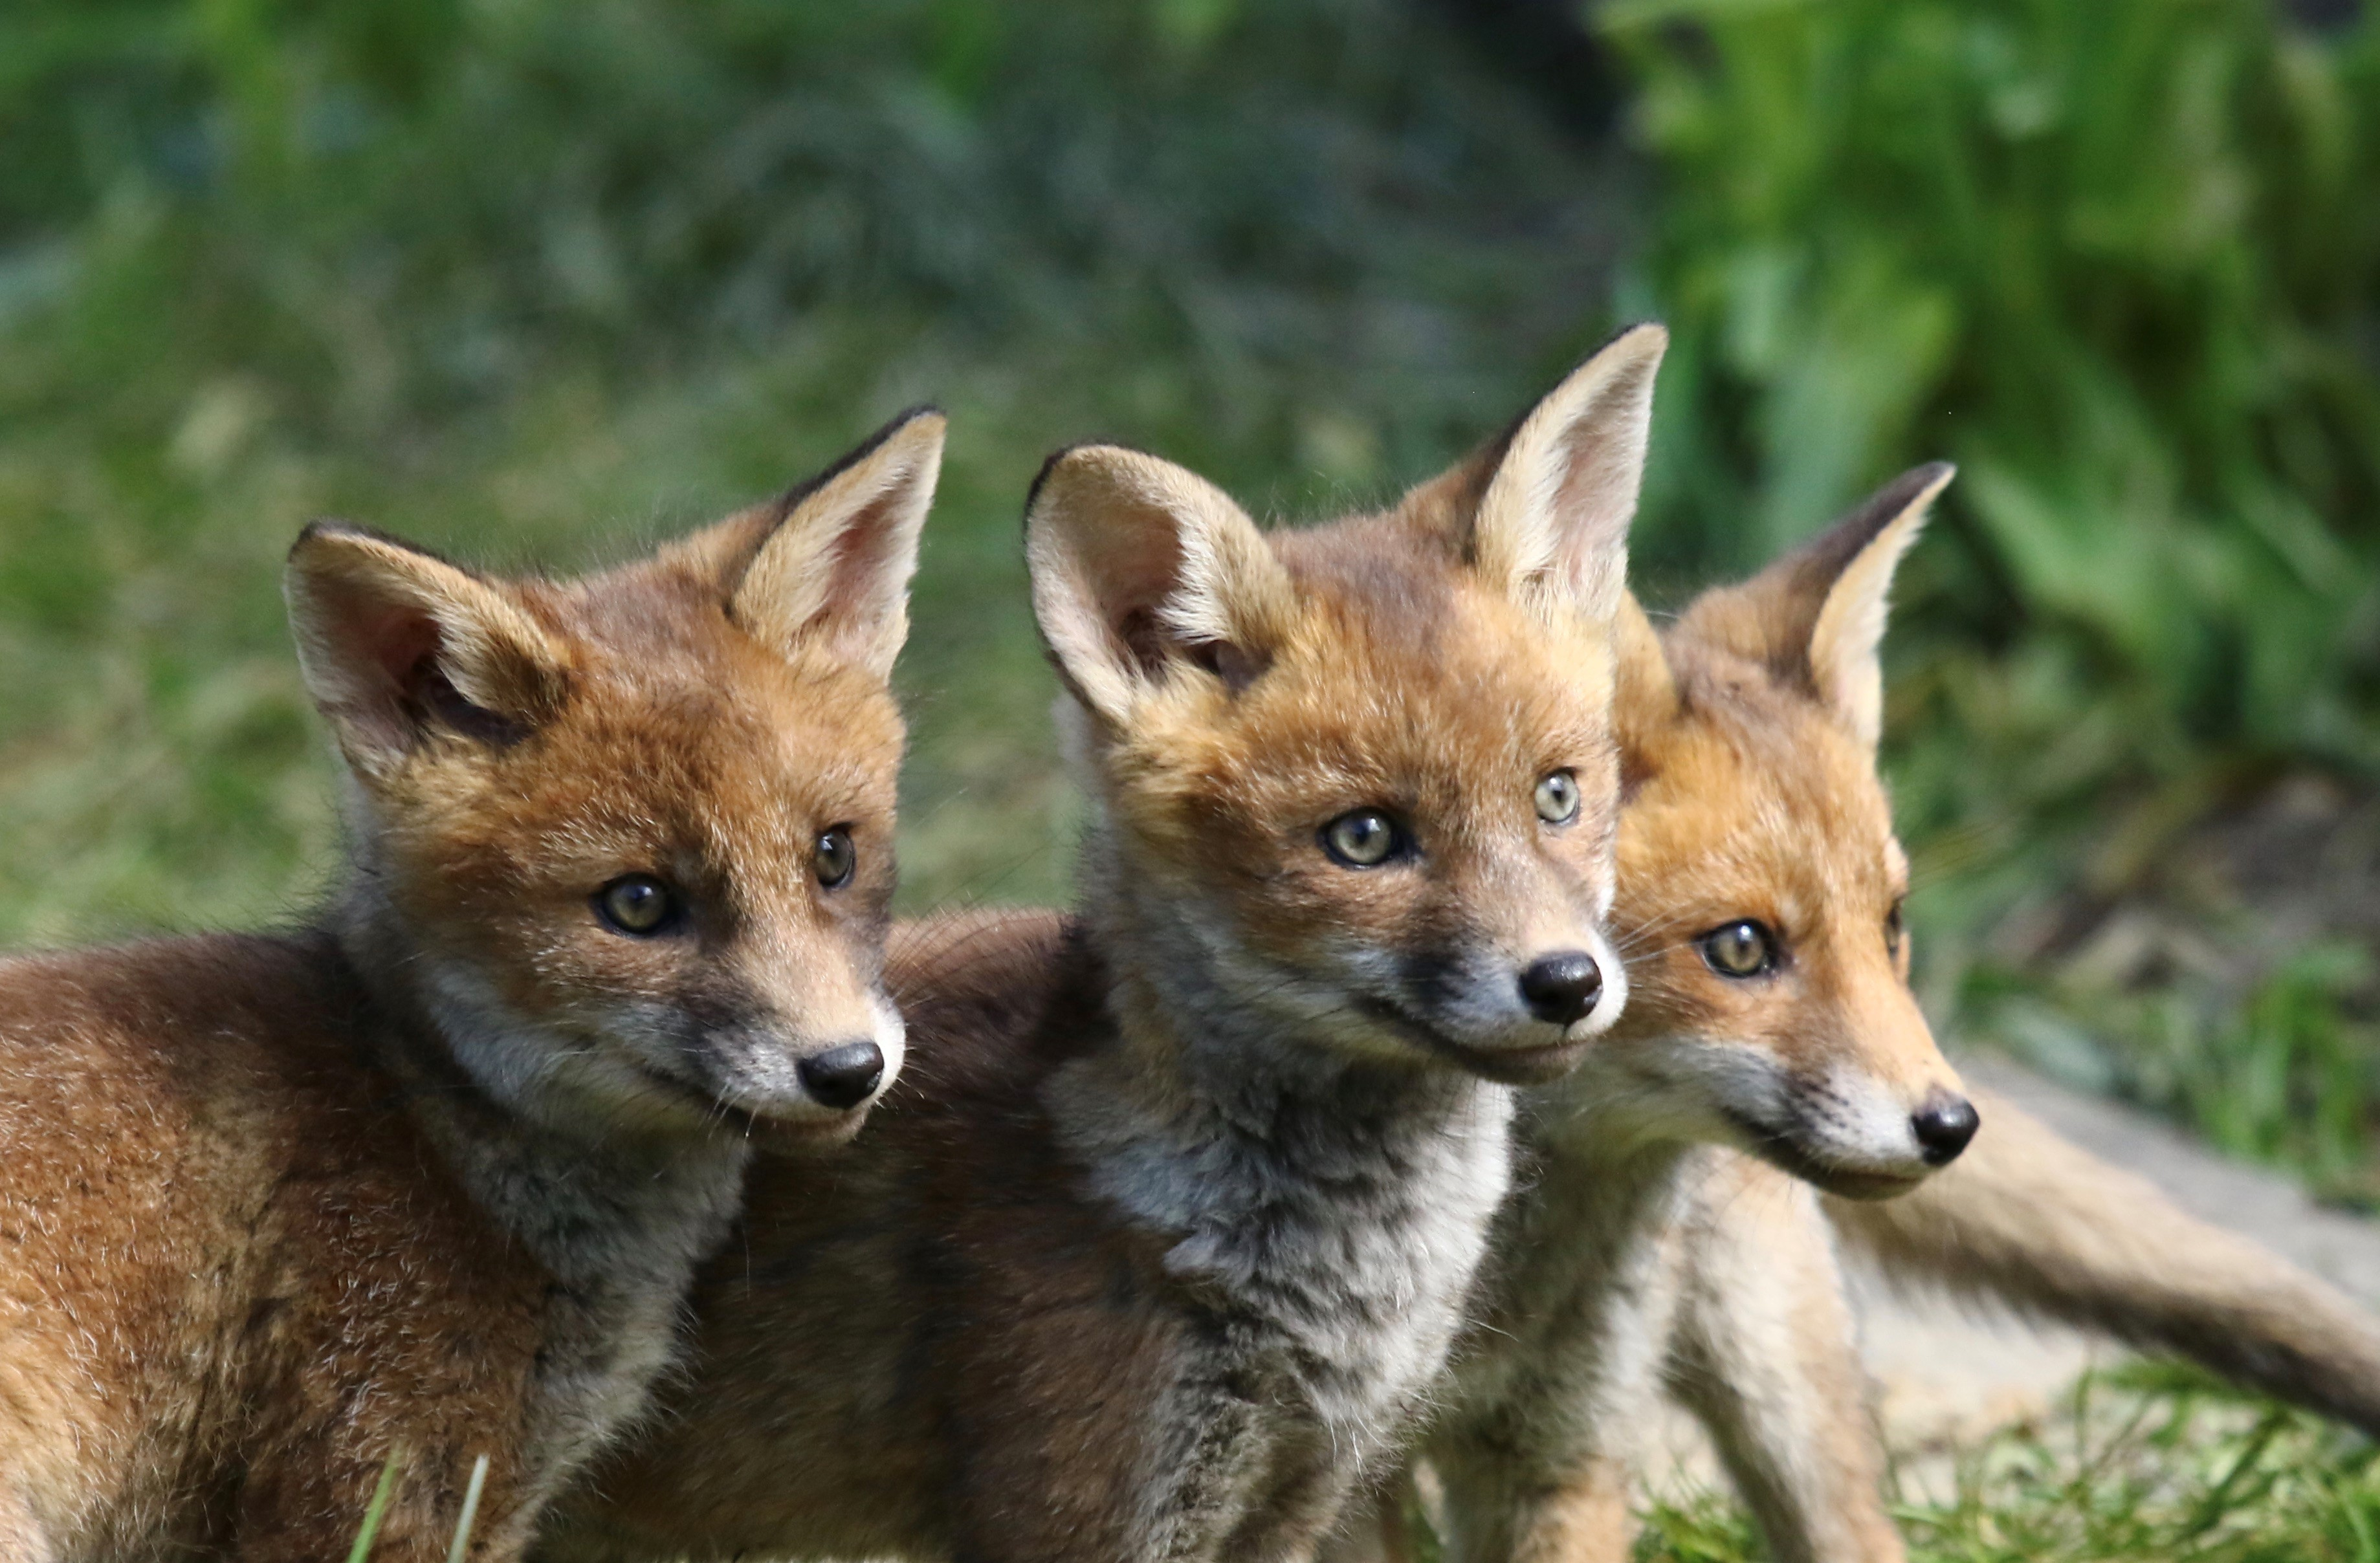 David philips foxes